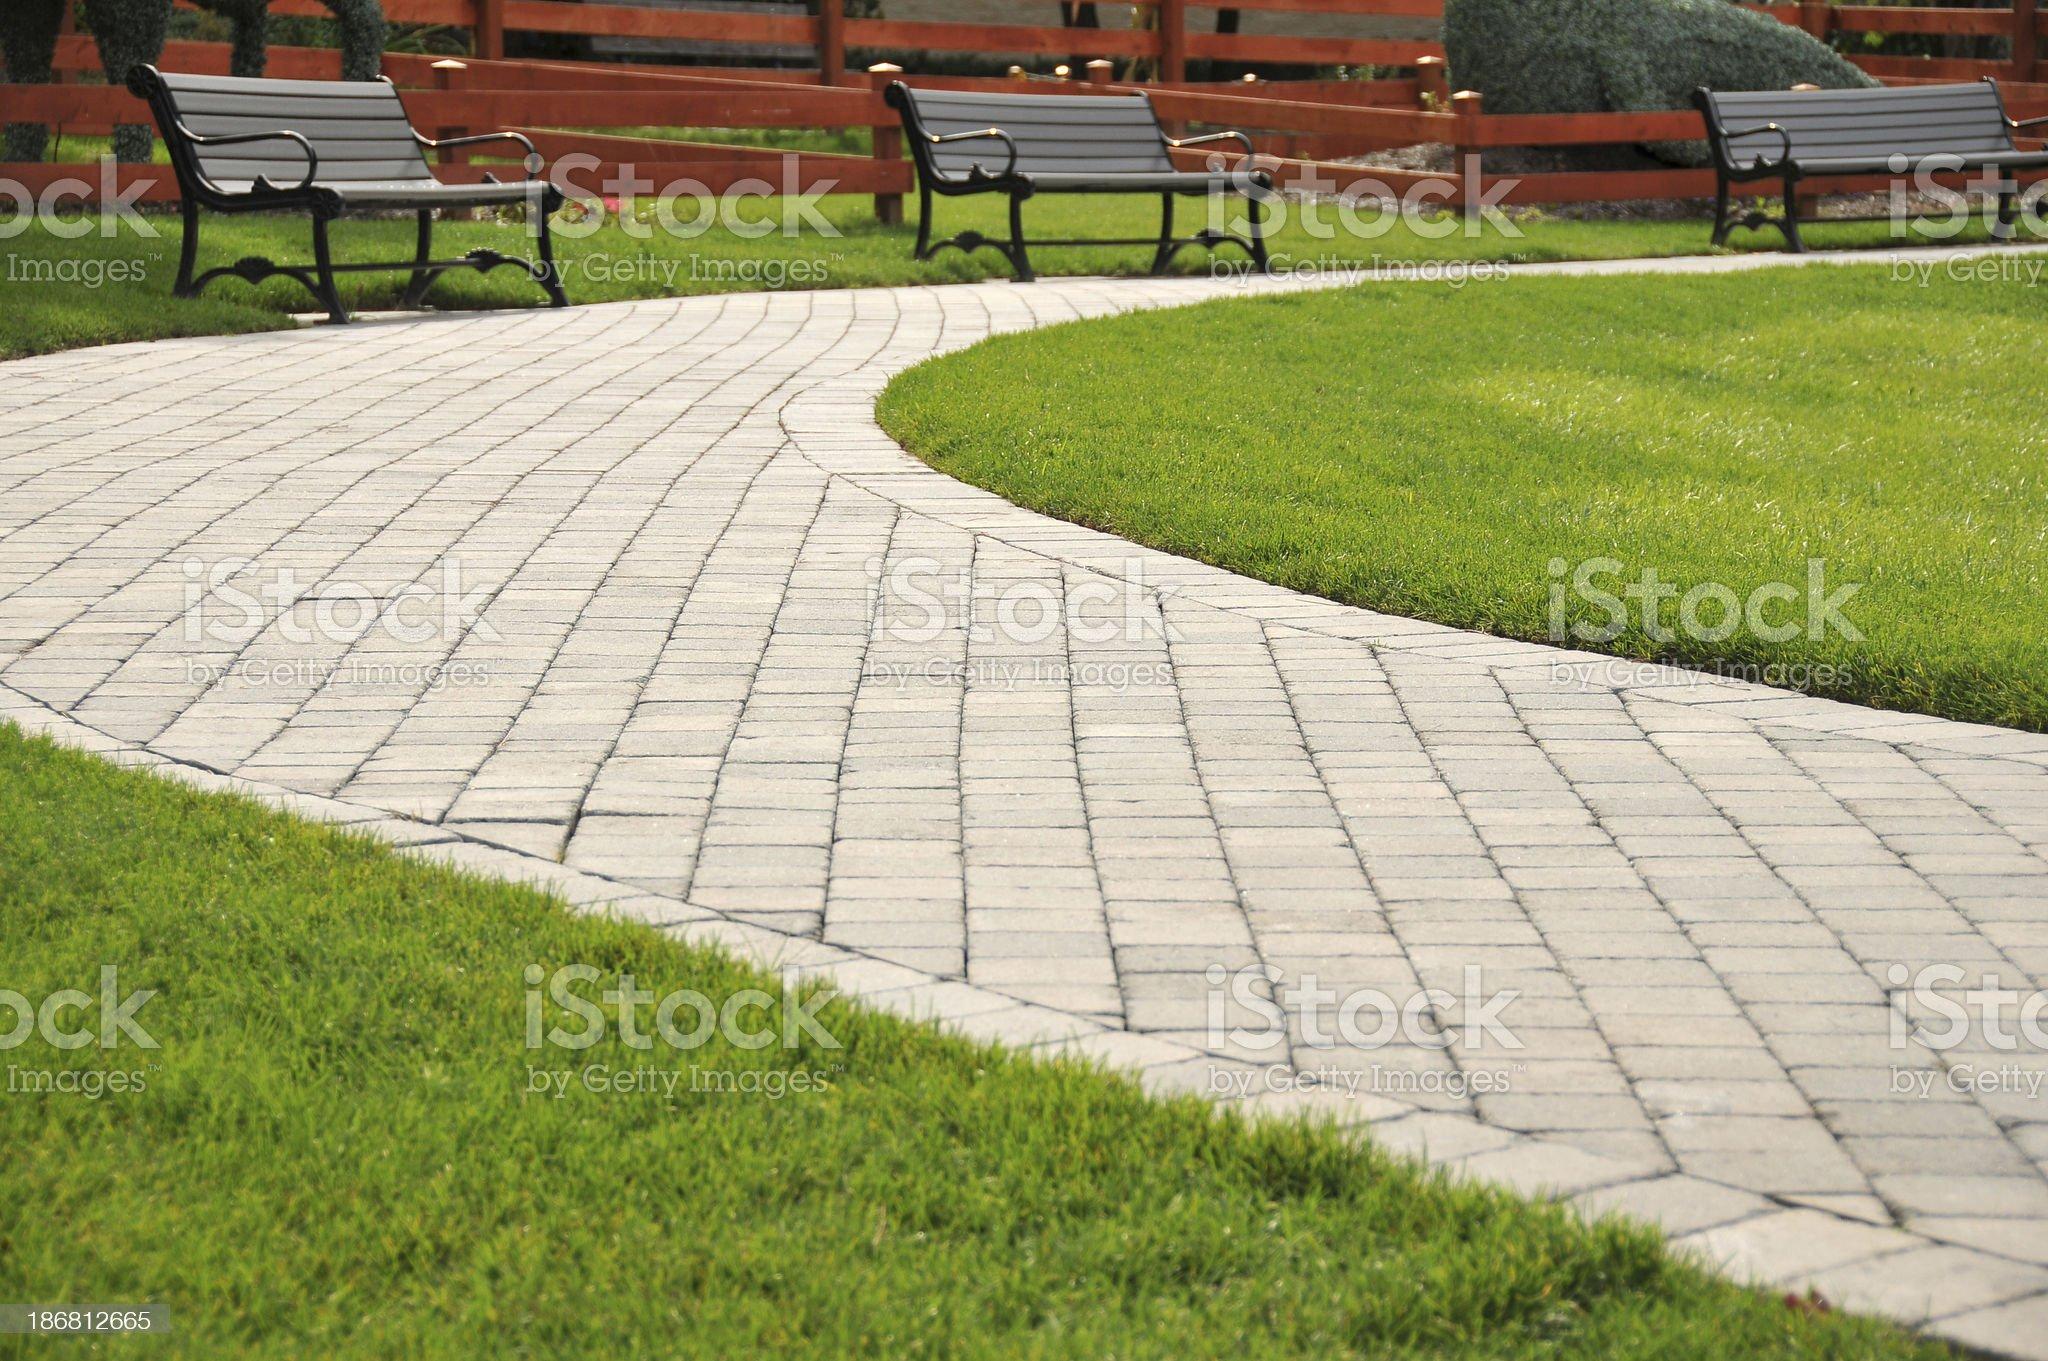 Paved Walkway royalty-free stock photo